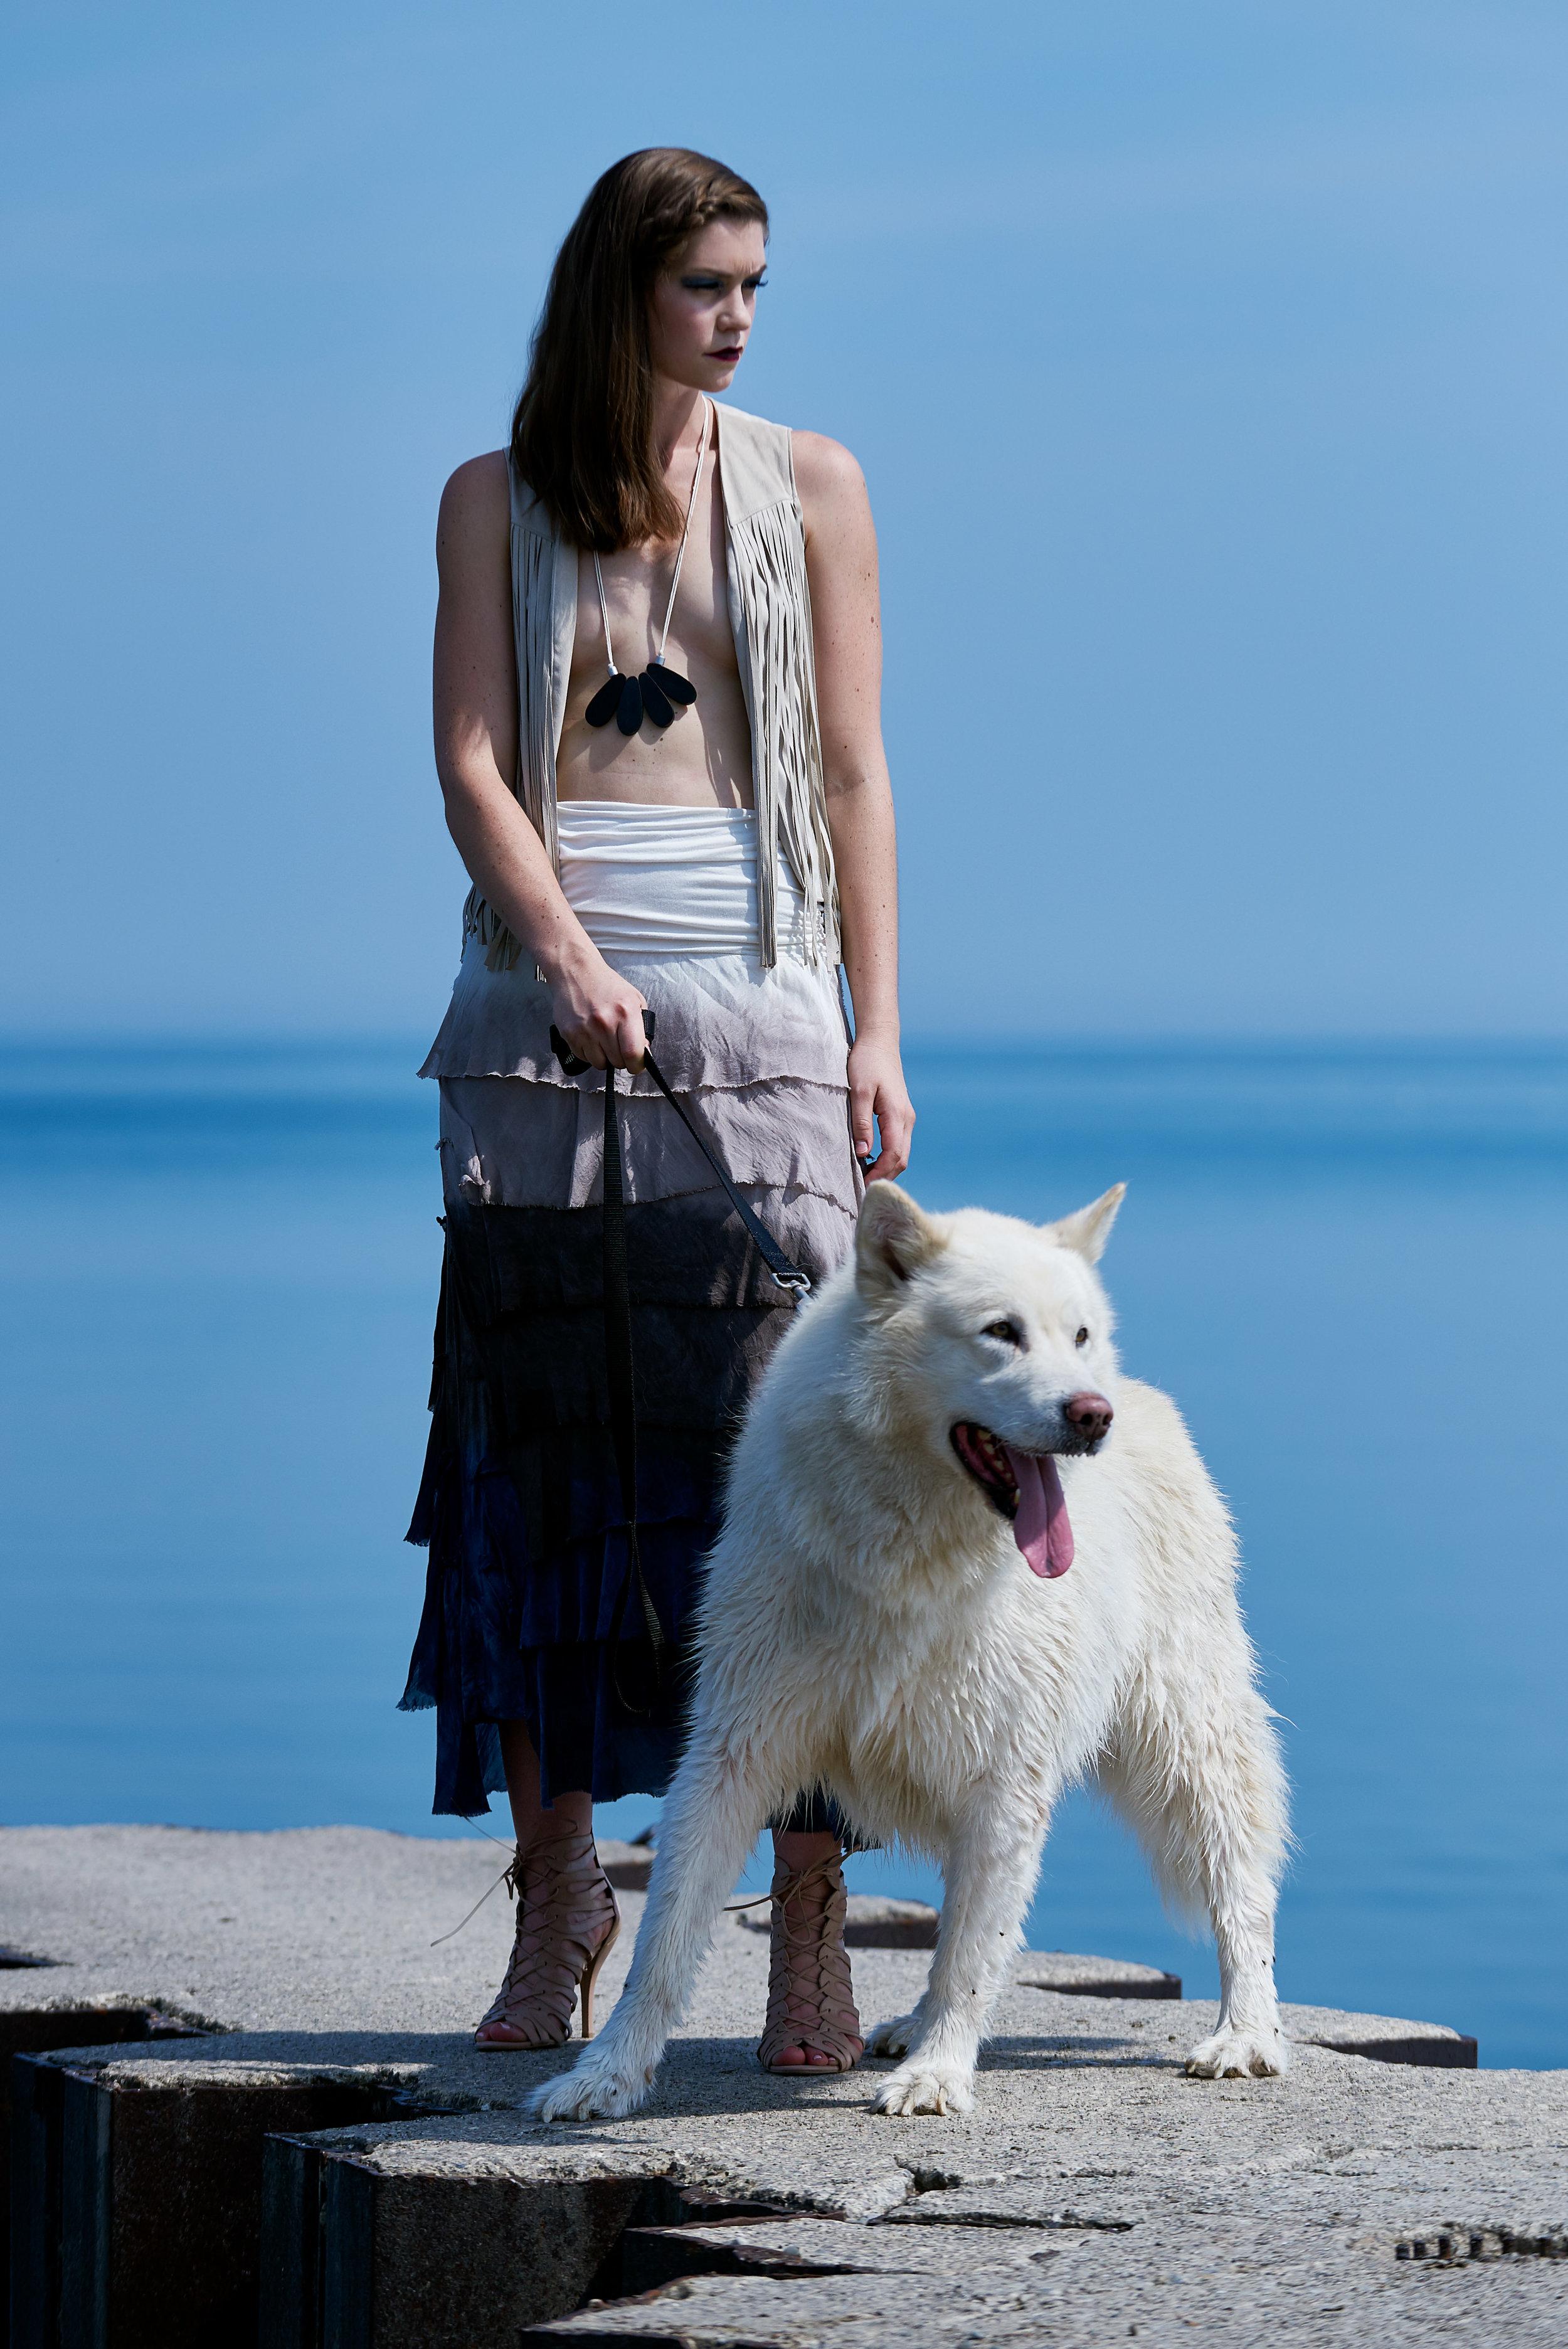 Marta-Hewson-Vogue-Models-Fashion-Creative-Beach-Hamilton-4215.jpg